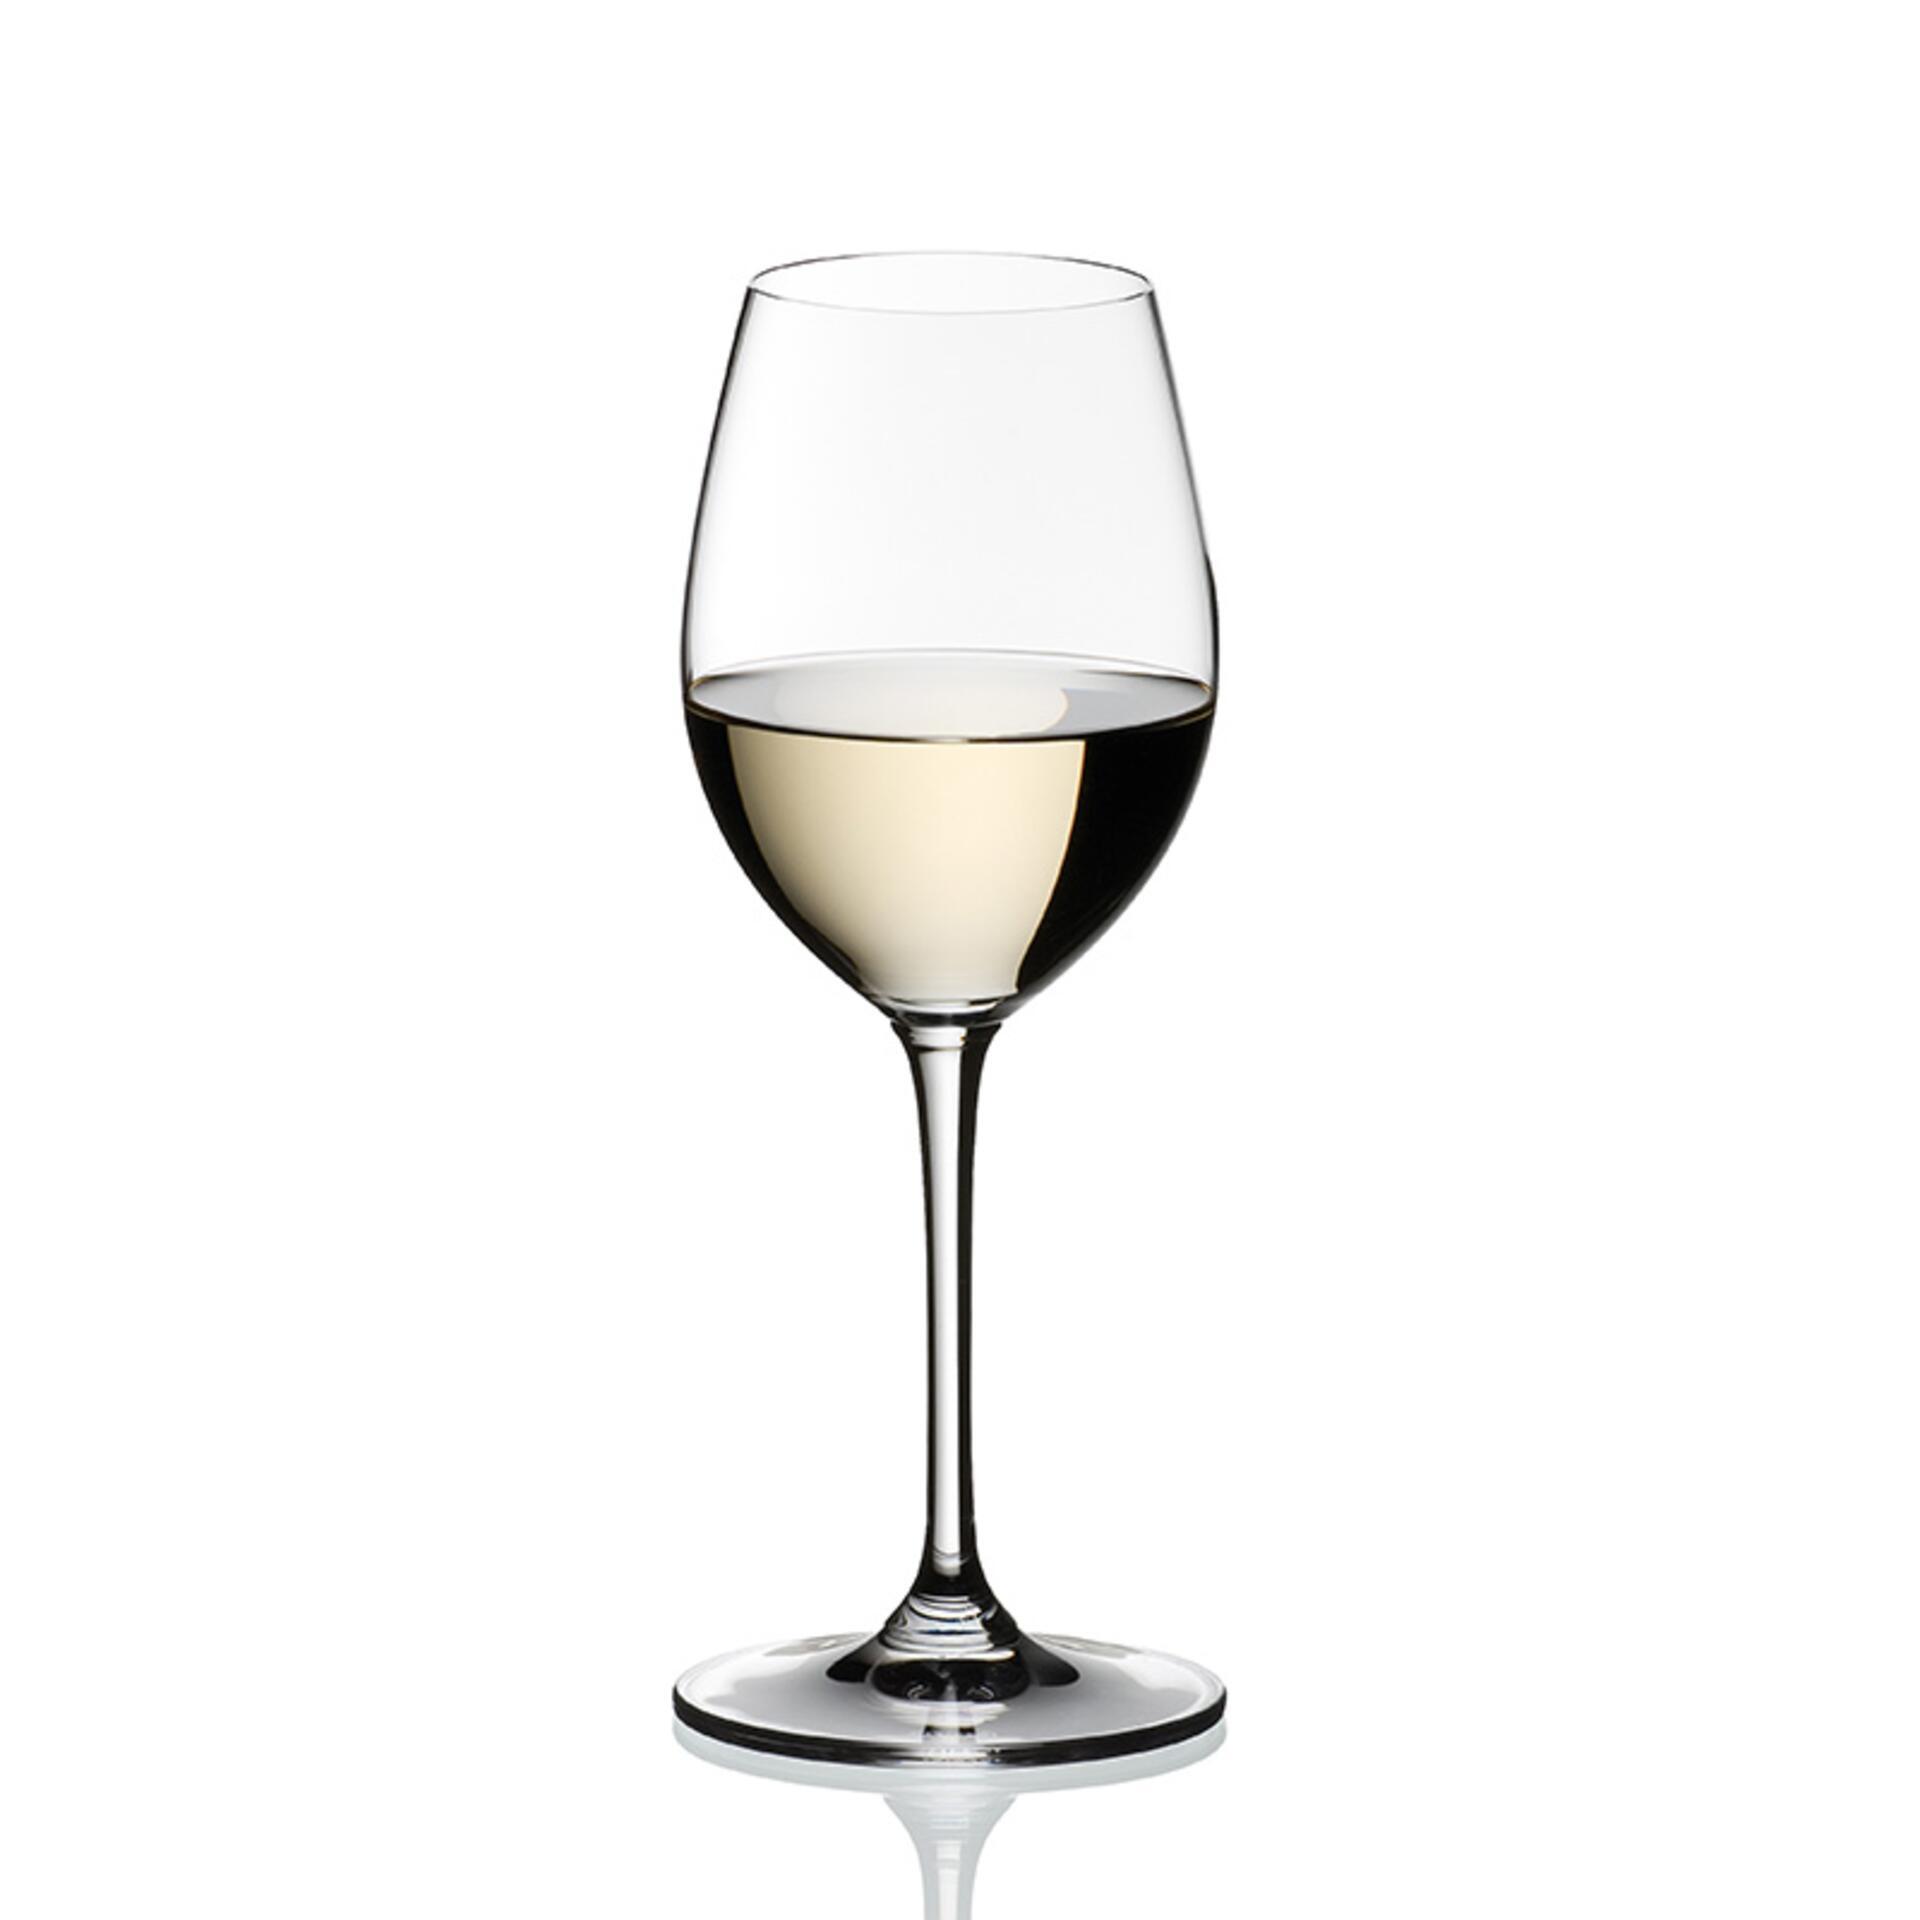 Riedel Vinum Sauvignon Blanc 2 Stück 6416-33